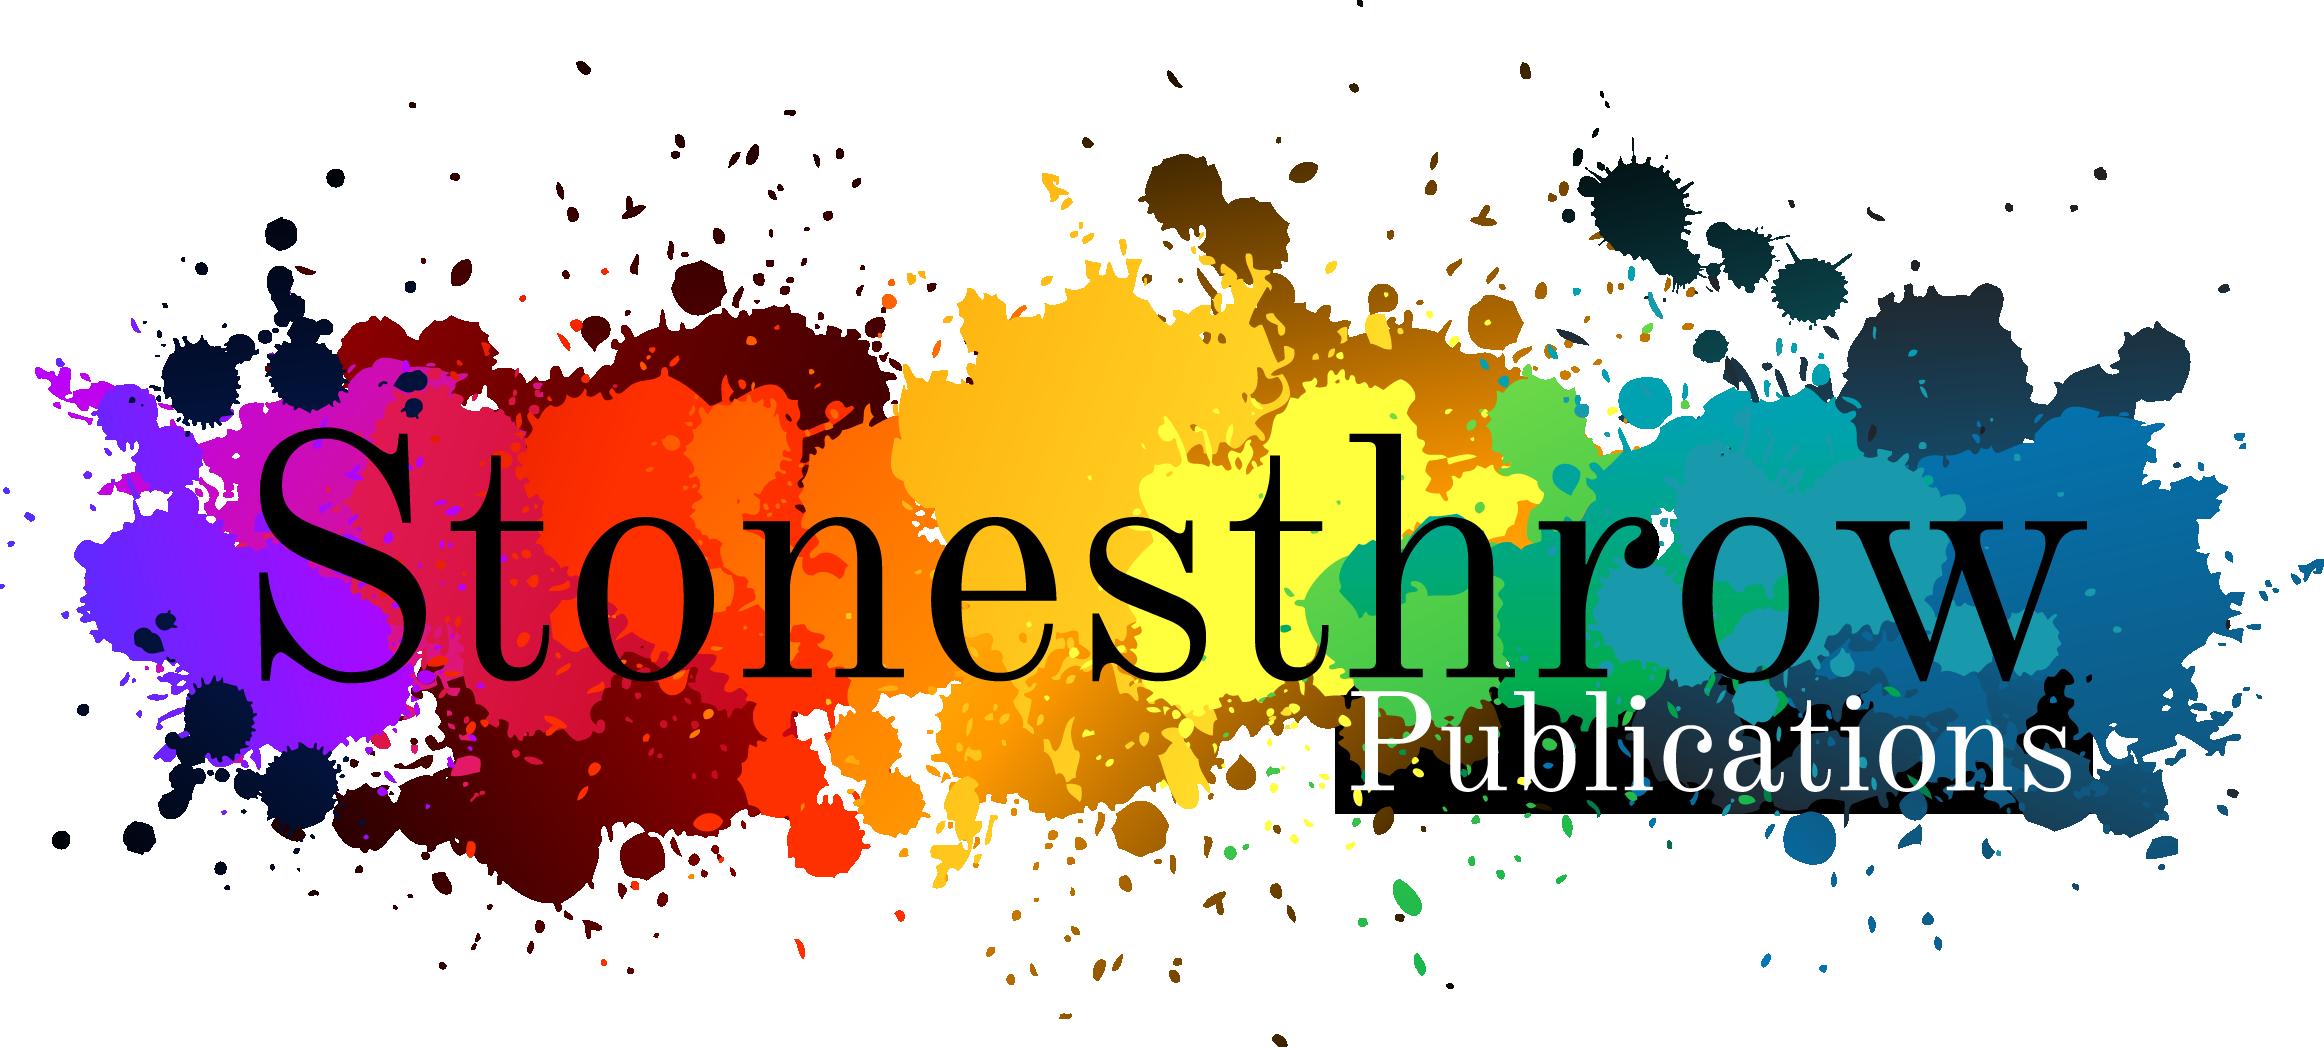 stonesthrowpublications